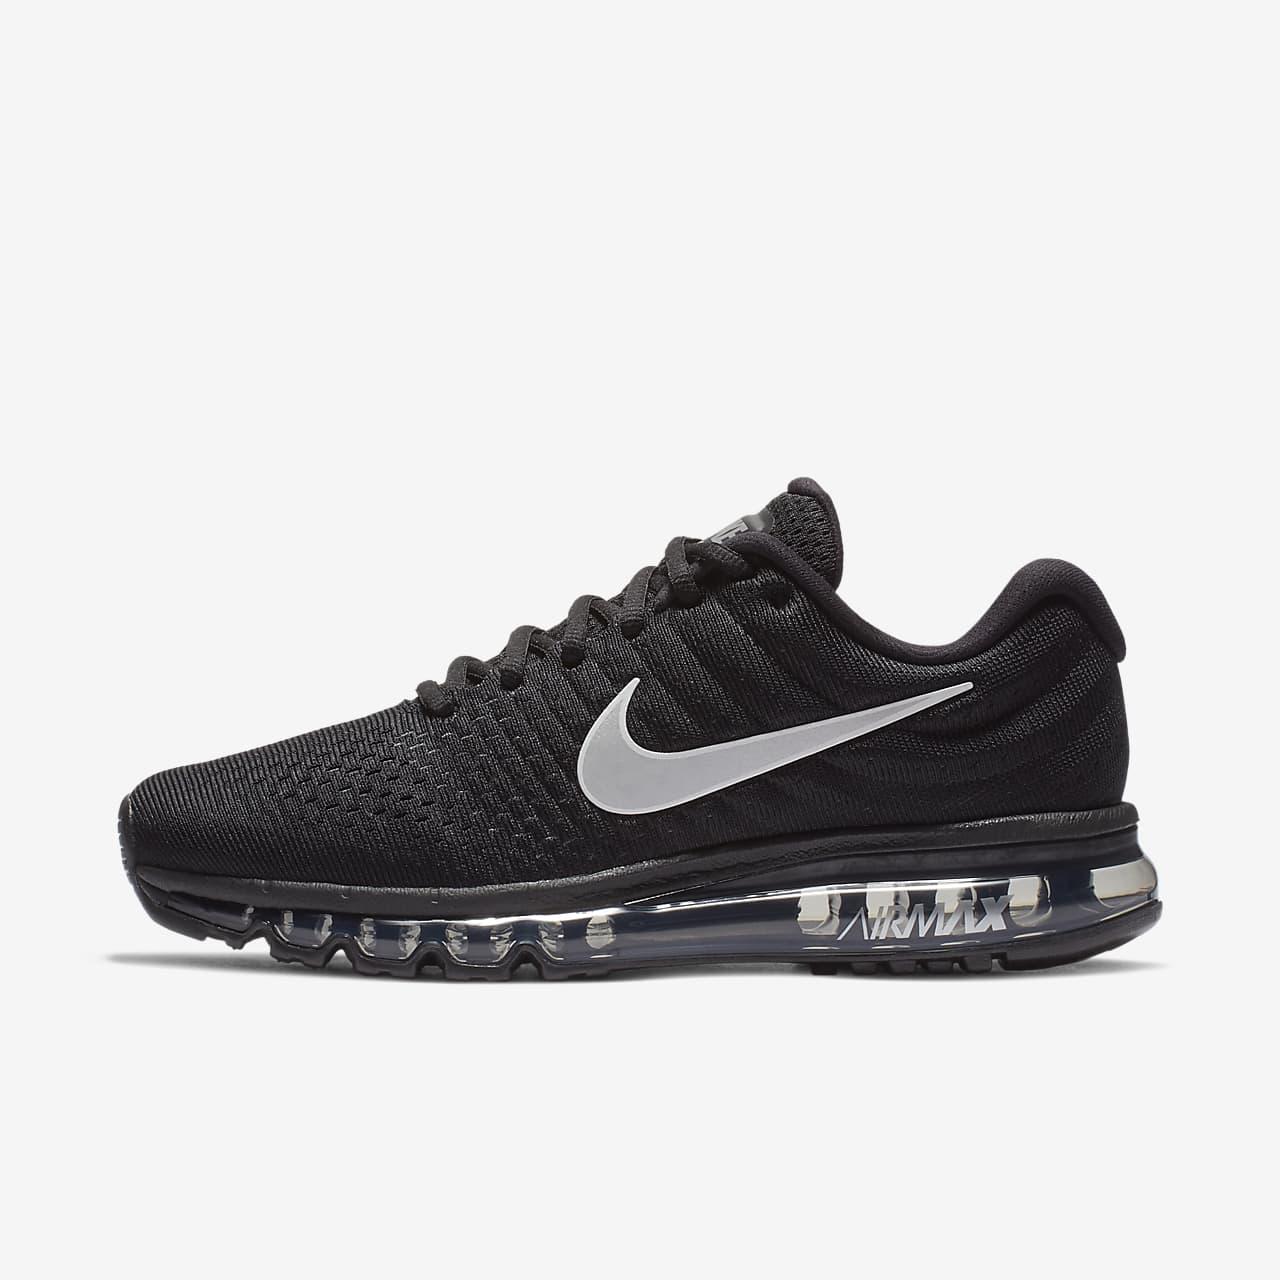 ... Chaussure de running Nike Air Max 2017 pour Homme